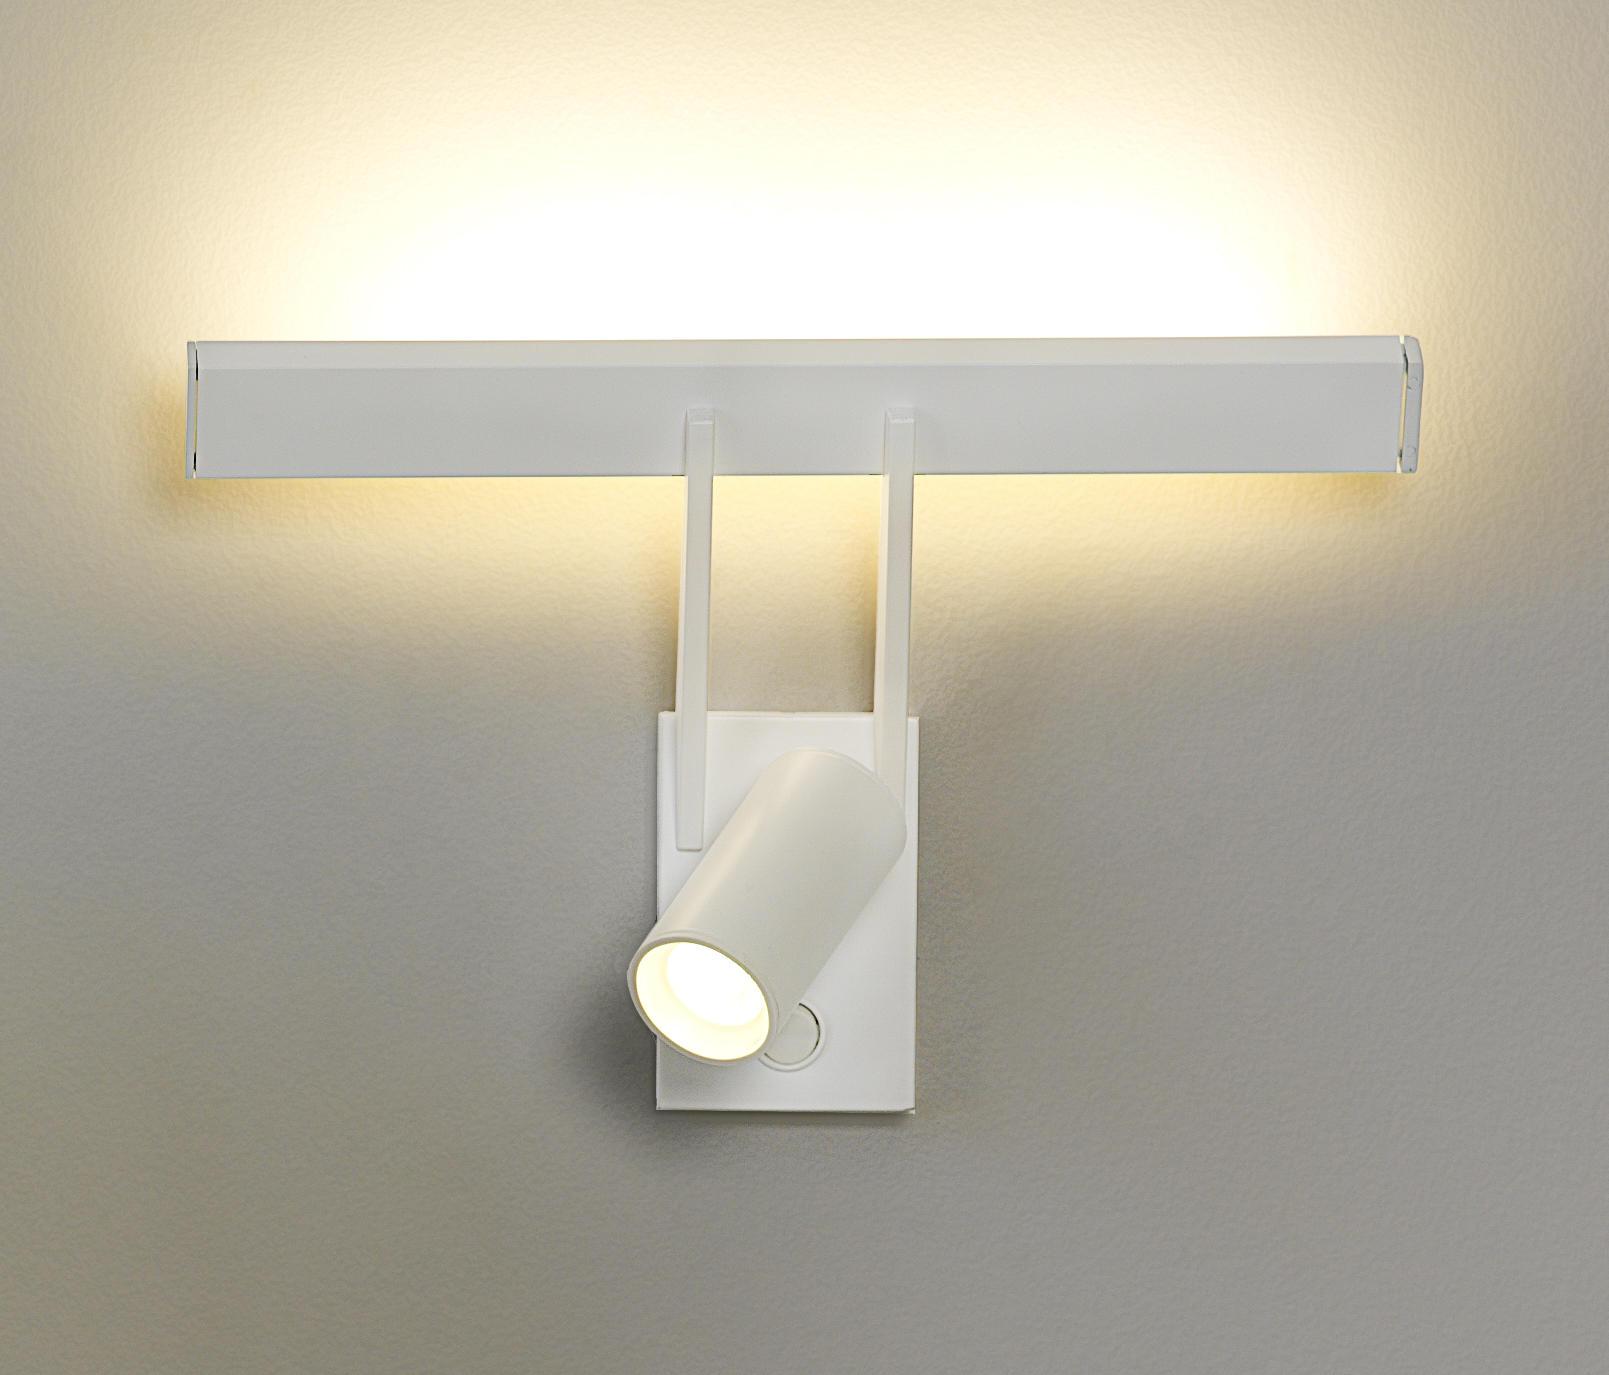 Tub led 6513 wall mounted spotlights from mil n - Iluminacion exterior led ...